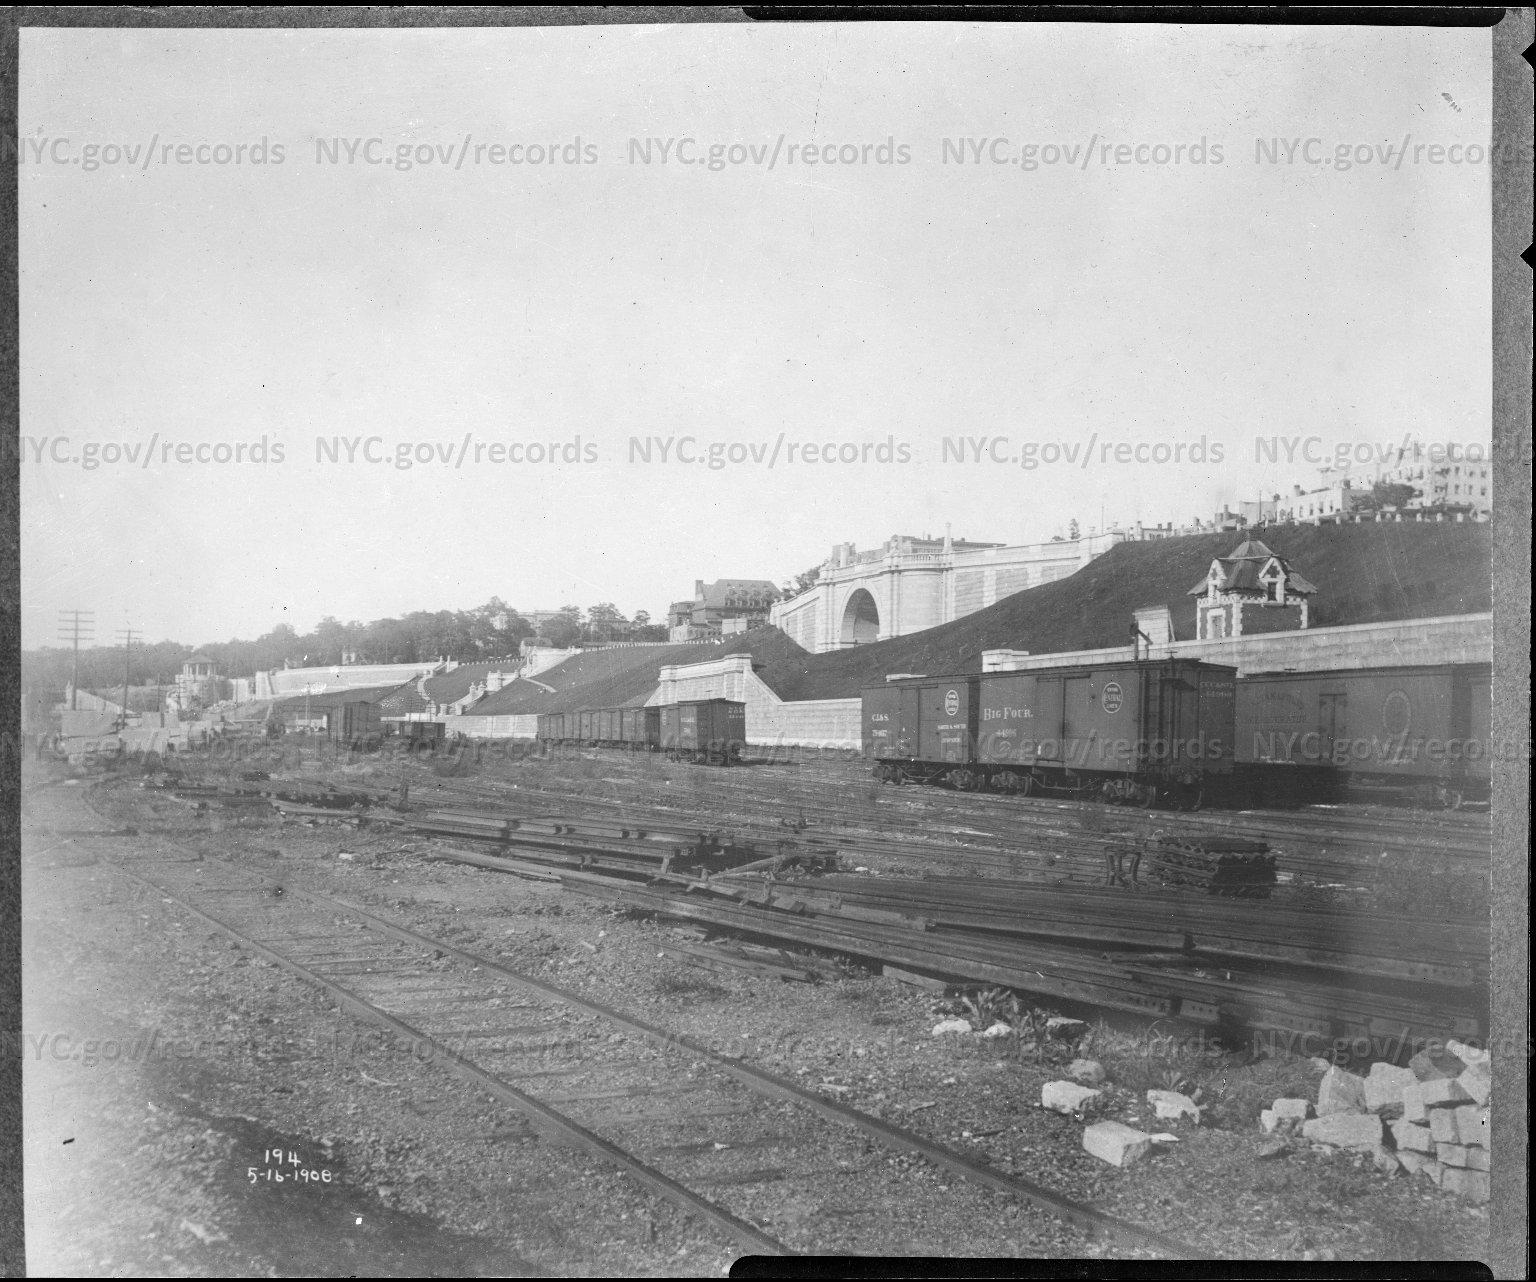 Looking northeast from Railroad tracks toward Riverside drive Arch